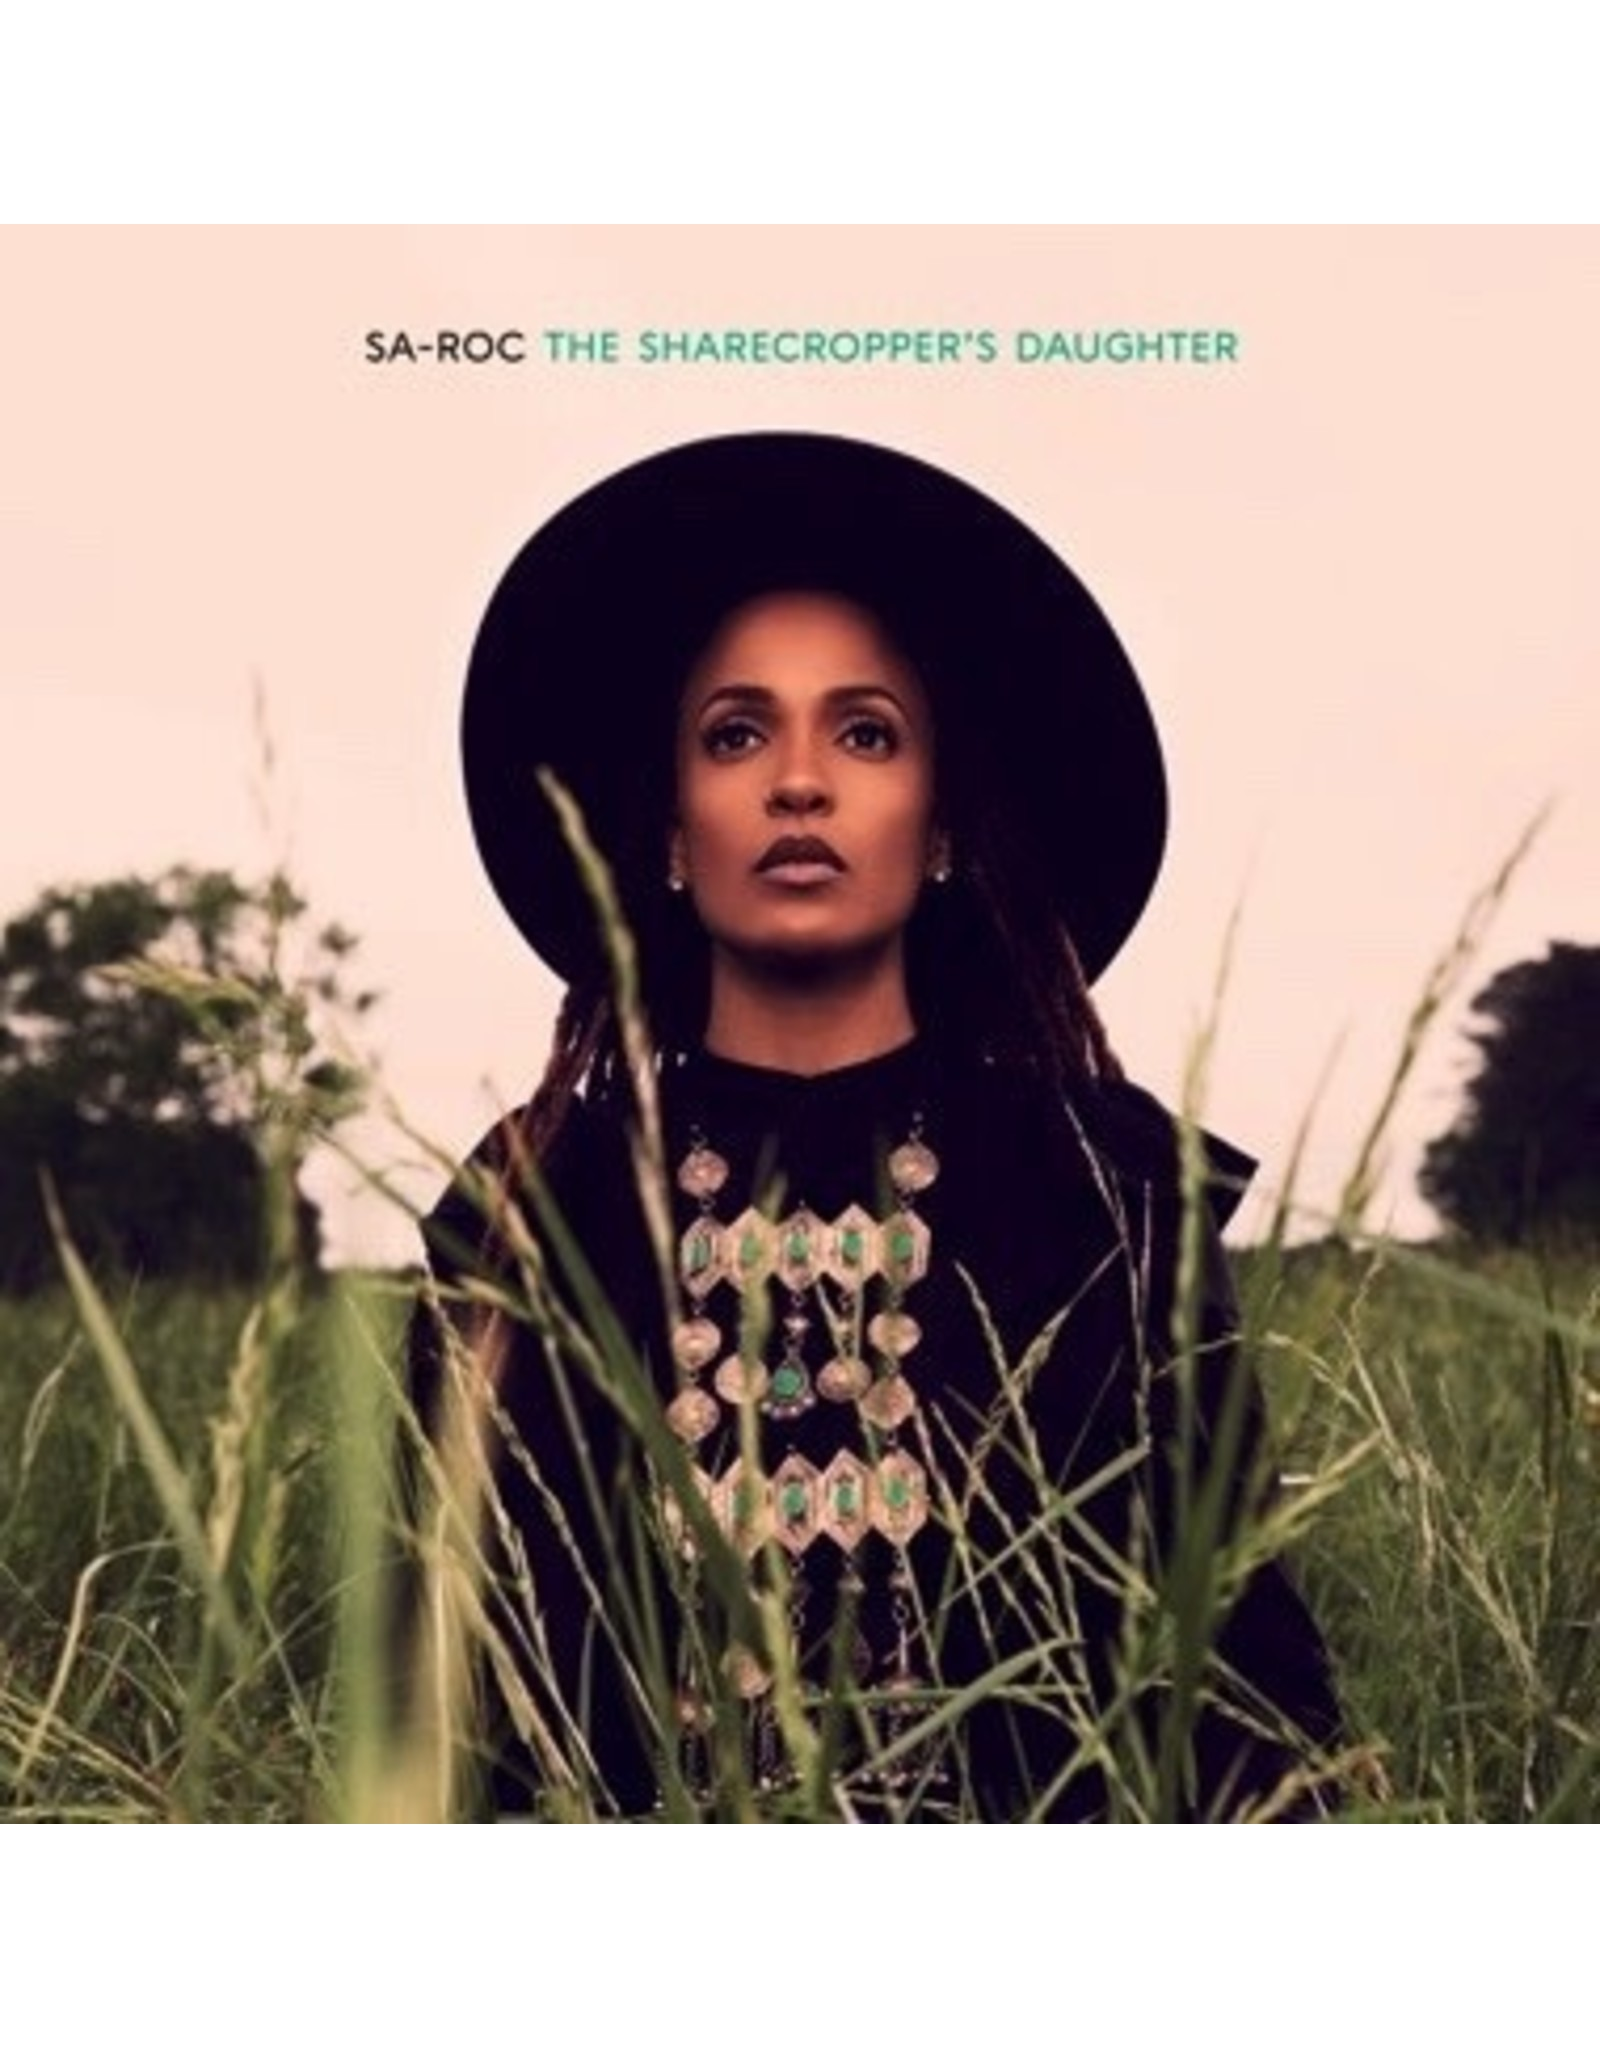 New Vinyl Sa-Roc - The Sharecropper's Daughter 2LP